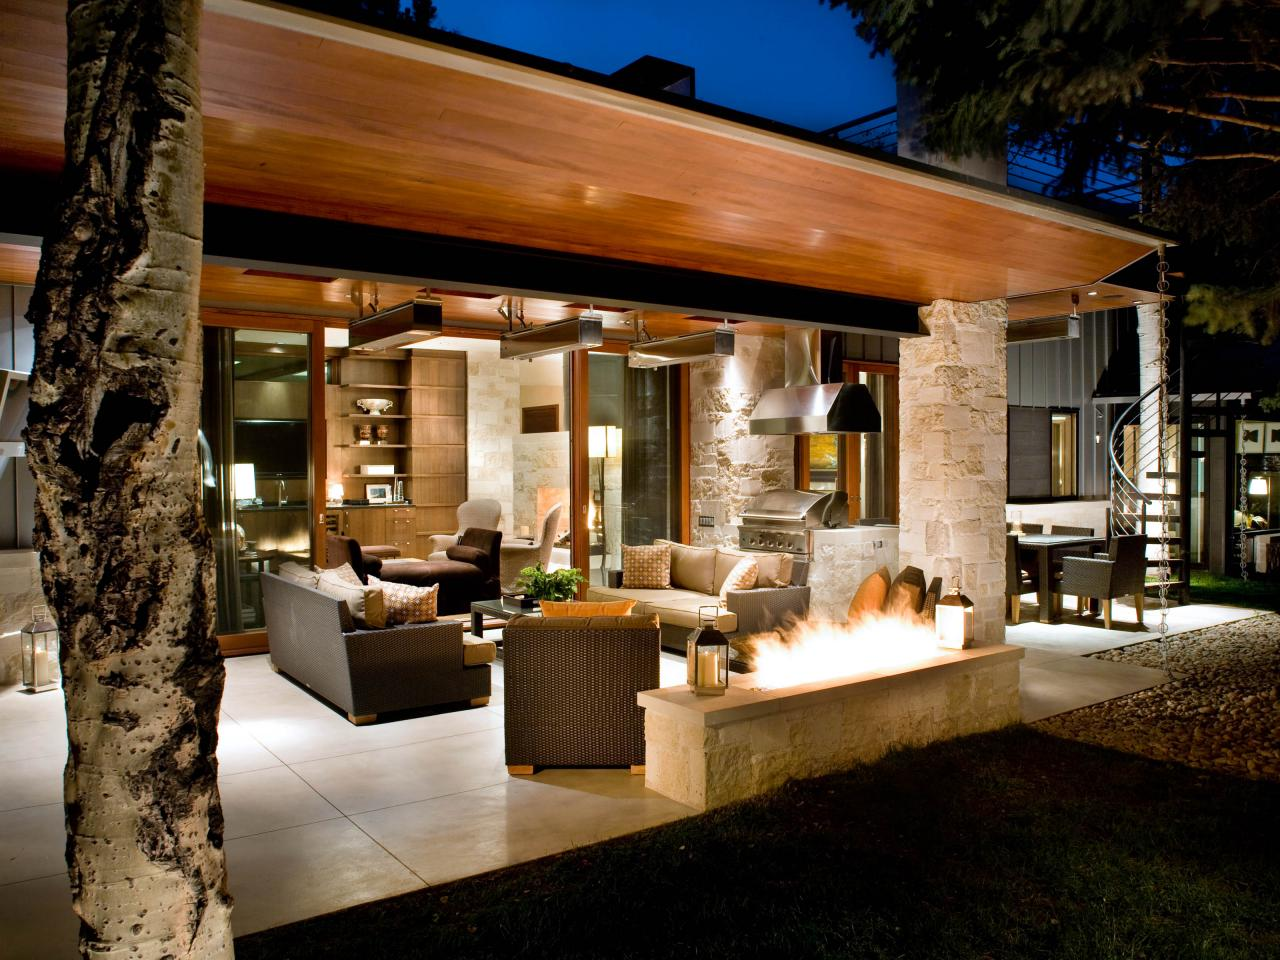 Furniture Decor Design Rugs Lamps